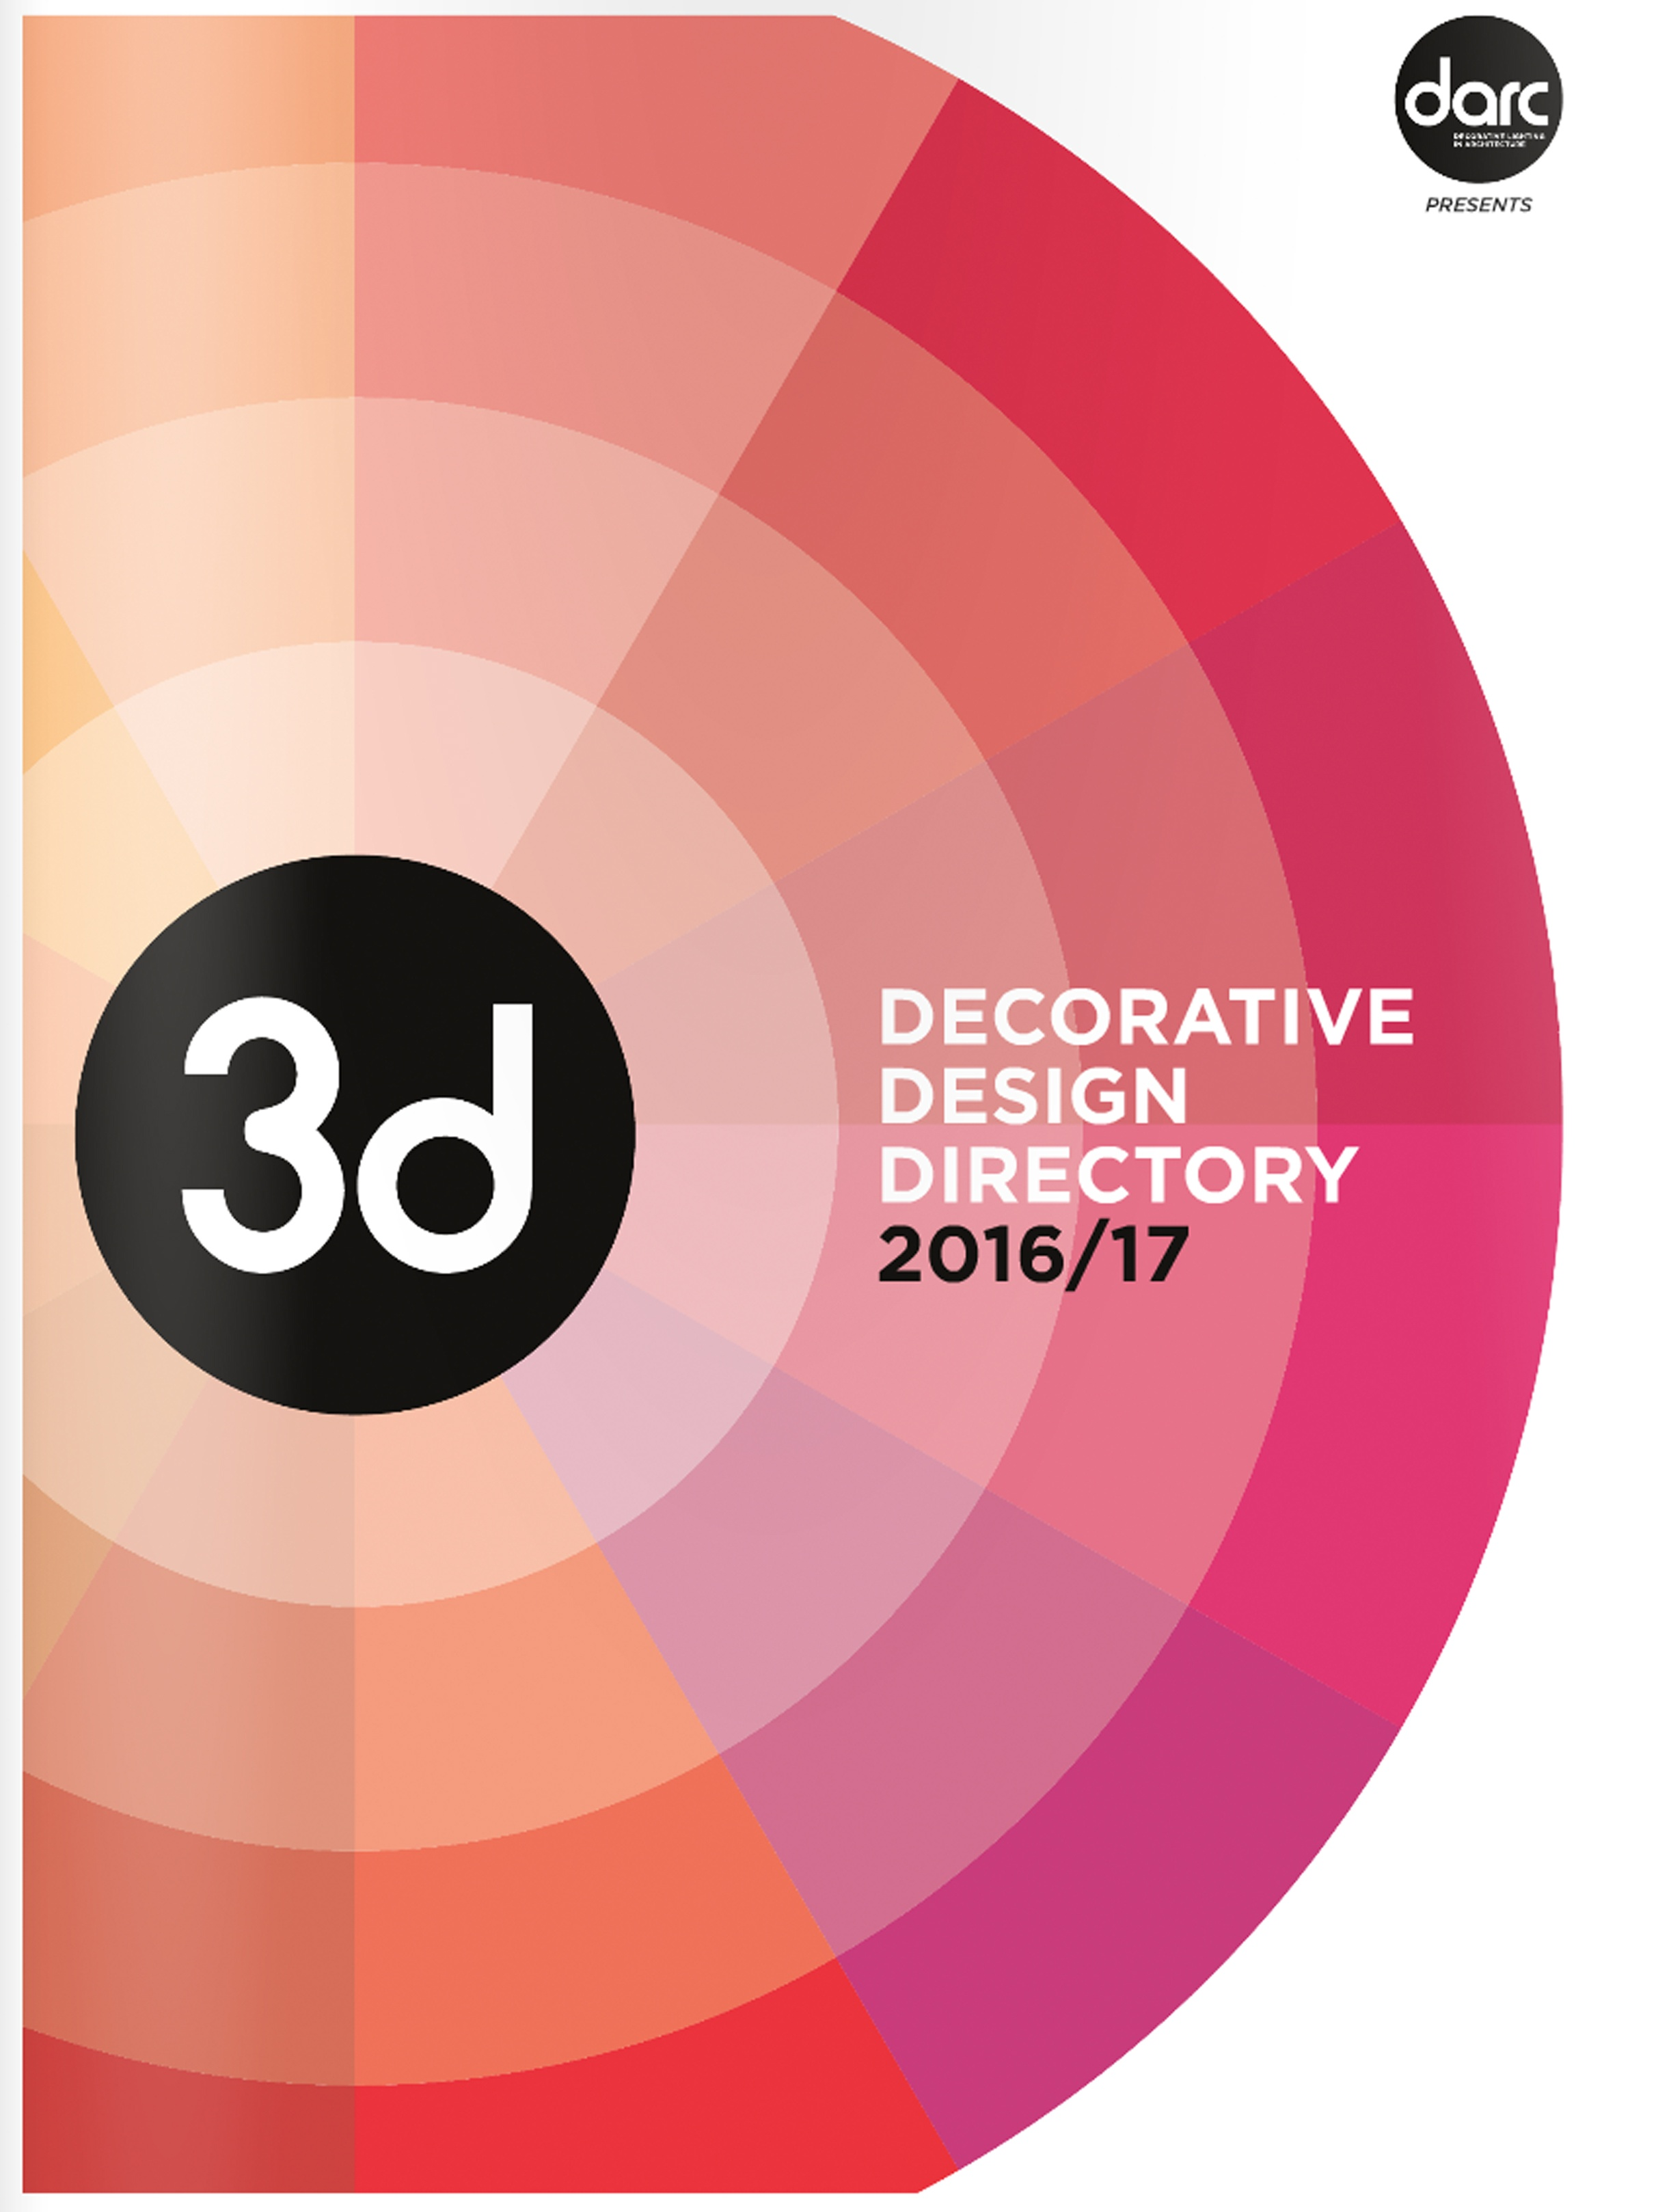 40-1_Darc_Decorative_Design_Directory-Cover.jpg